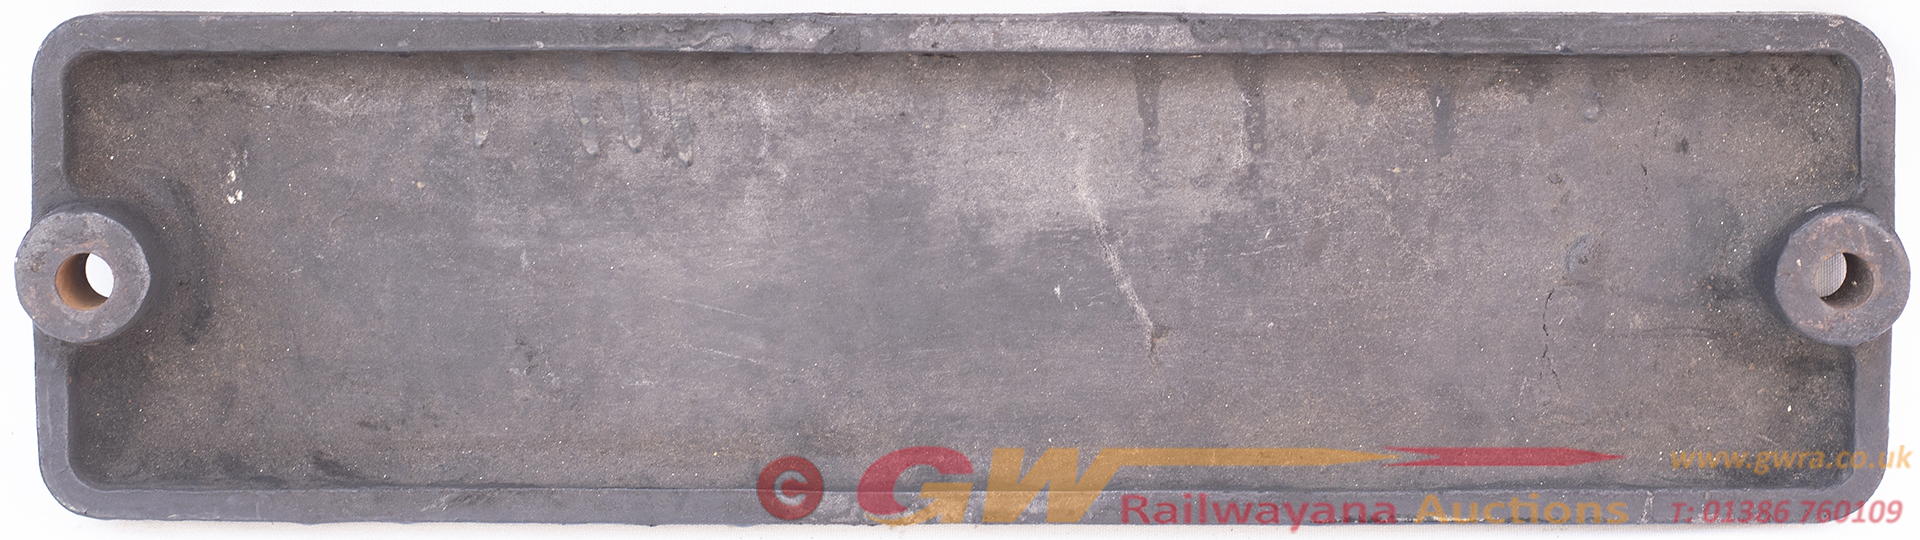 Smokebox Numberplate 35025 Ex SR Bullied Merchant